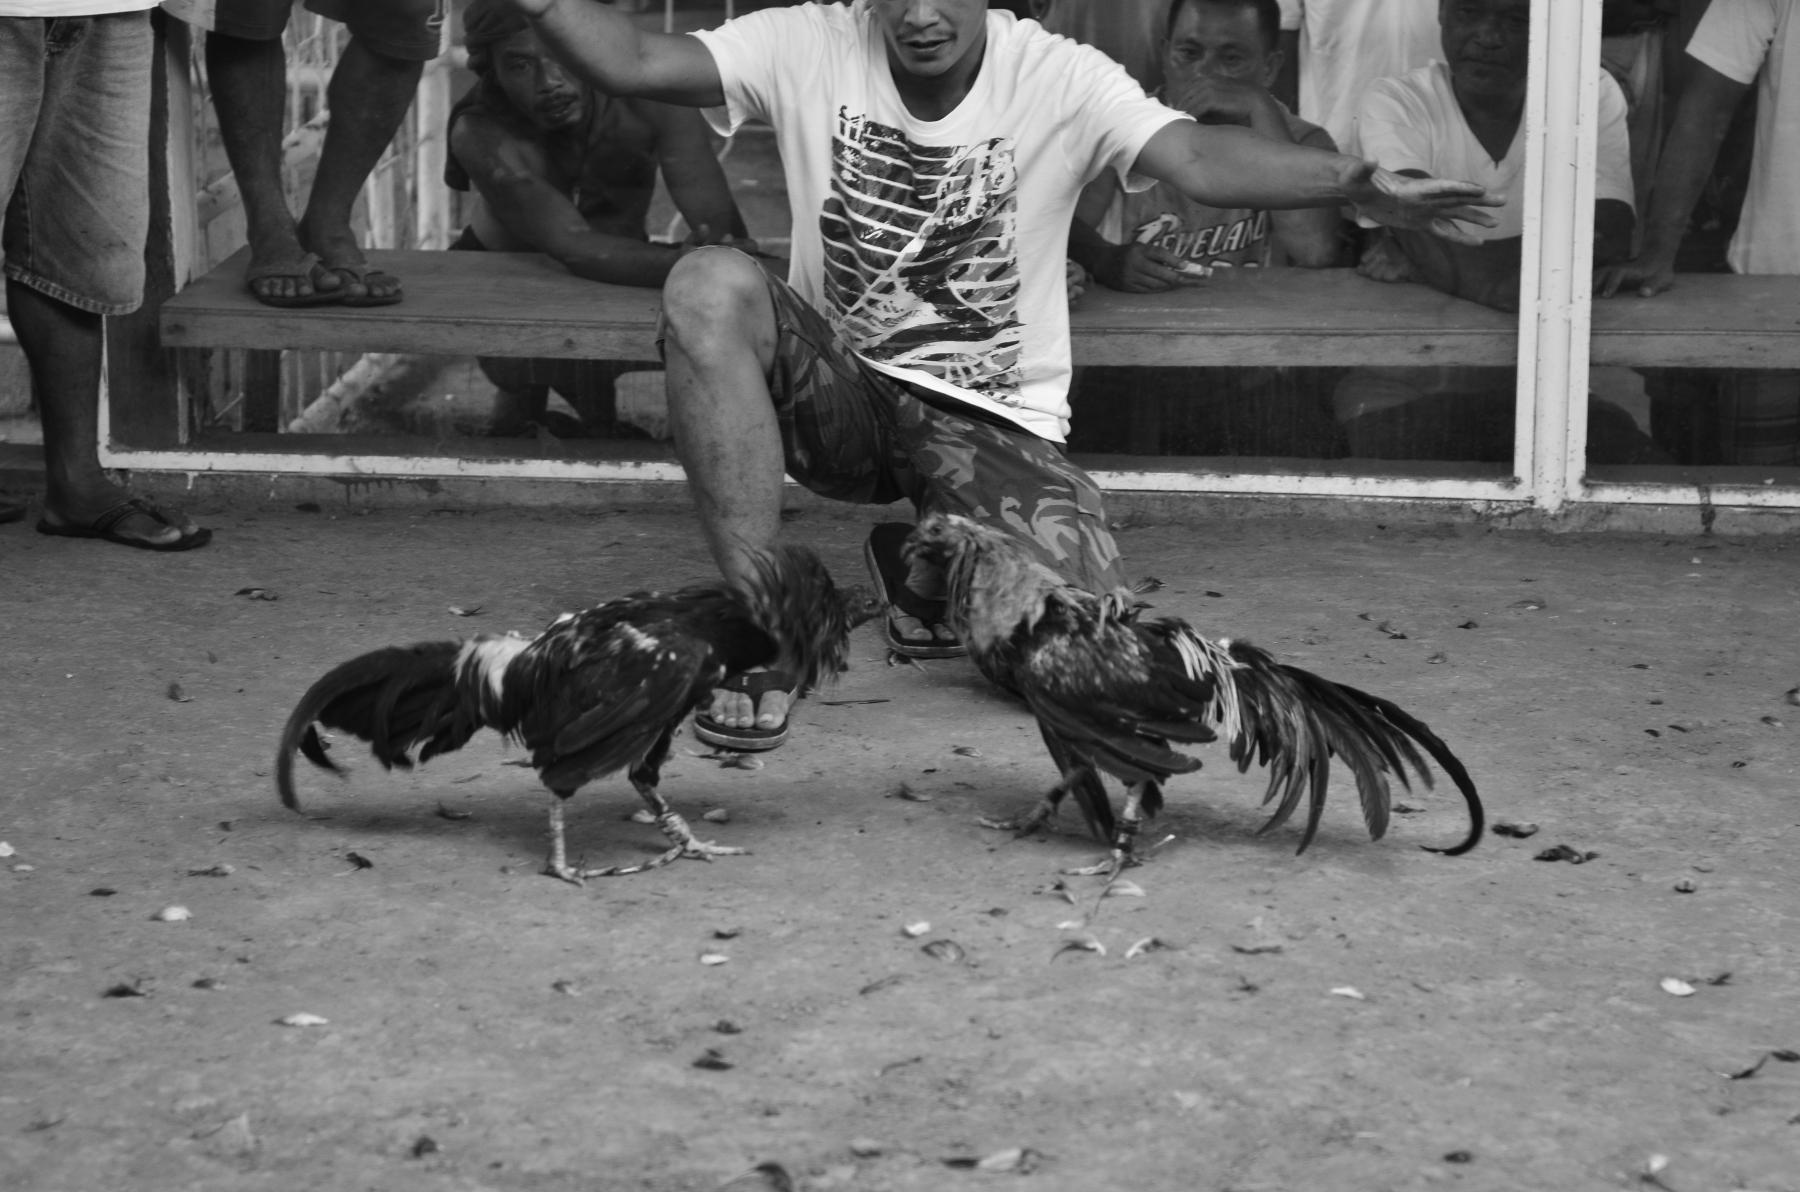 Malapascua_Phillipines_23072011_0510